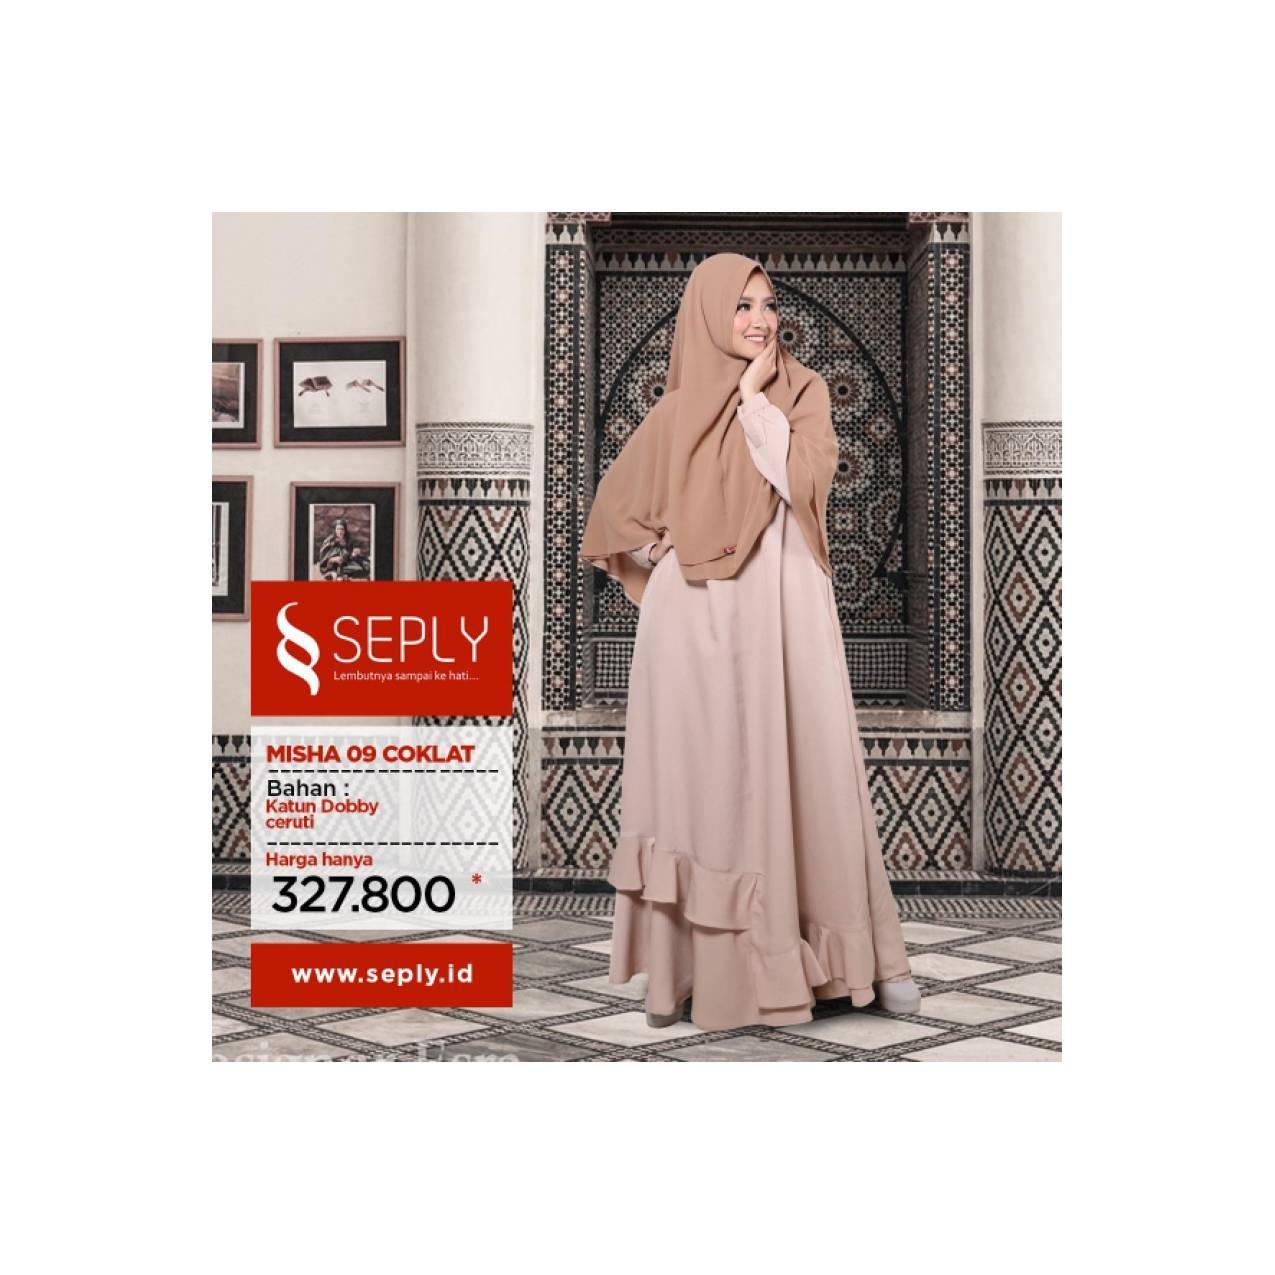 Gamis Set Syar'i Muslimah Modern Terbaru SEPLY Fashion MISHA 09 XL - Cokelat Muda, XL